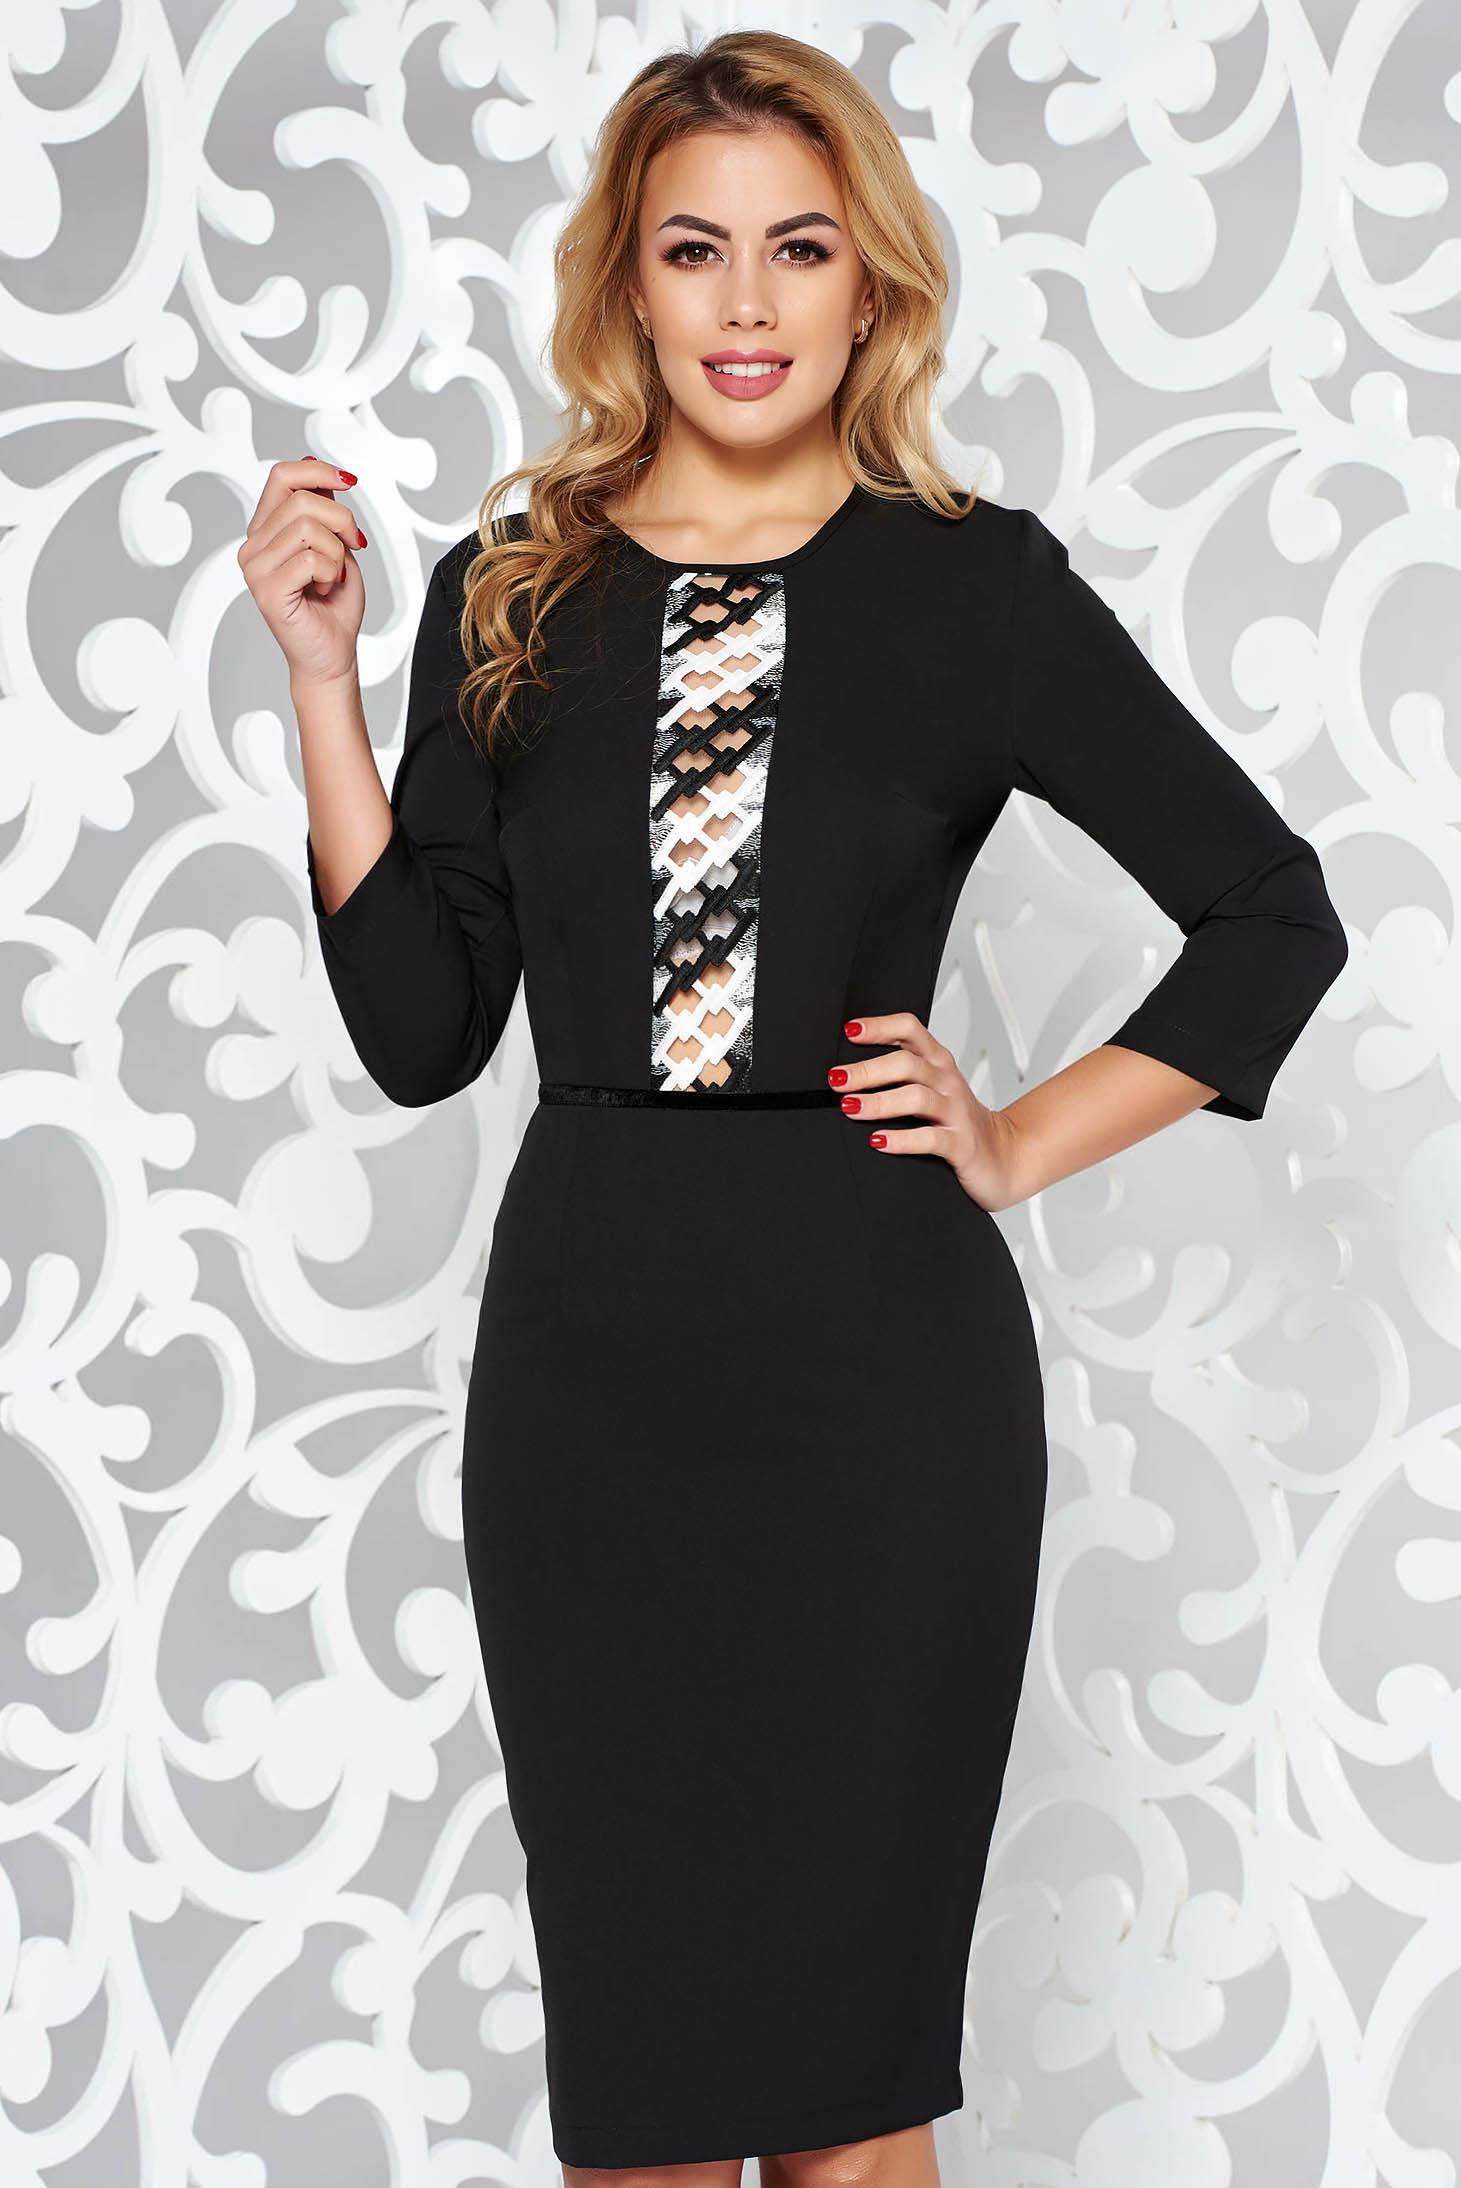 StarShinerS black elegant pencil dress 3/4 sleeve slightly elastic fabric front embroidery